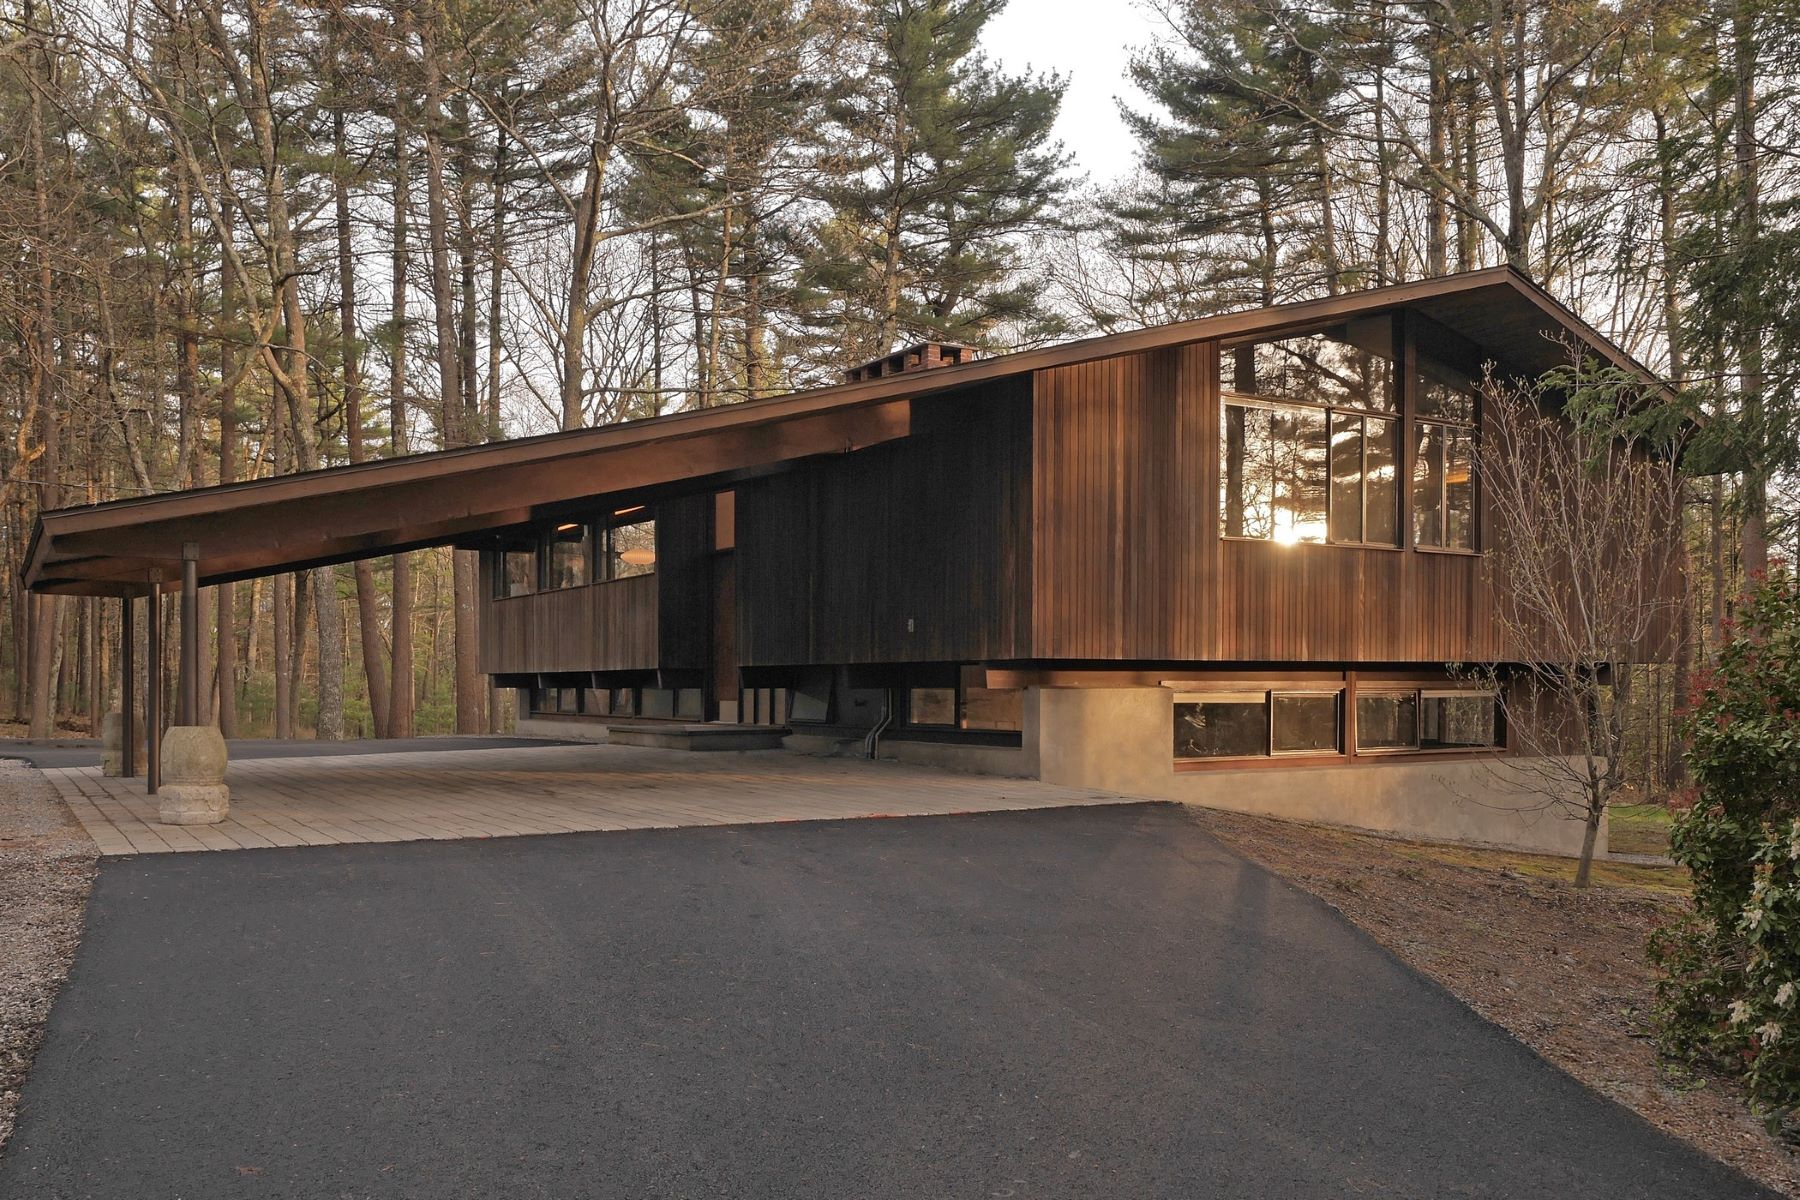 Single Family Home for Active at 188 Judy Farm Road, Carlisle 188 Judy Farm Rd Carlisle, Massachusetts 01741 United States